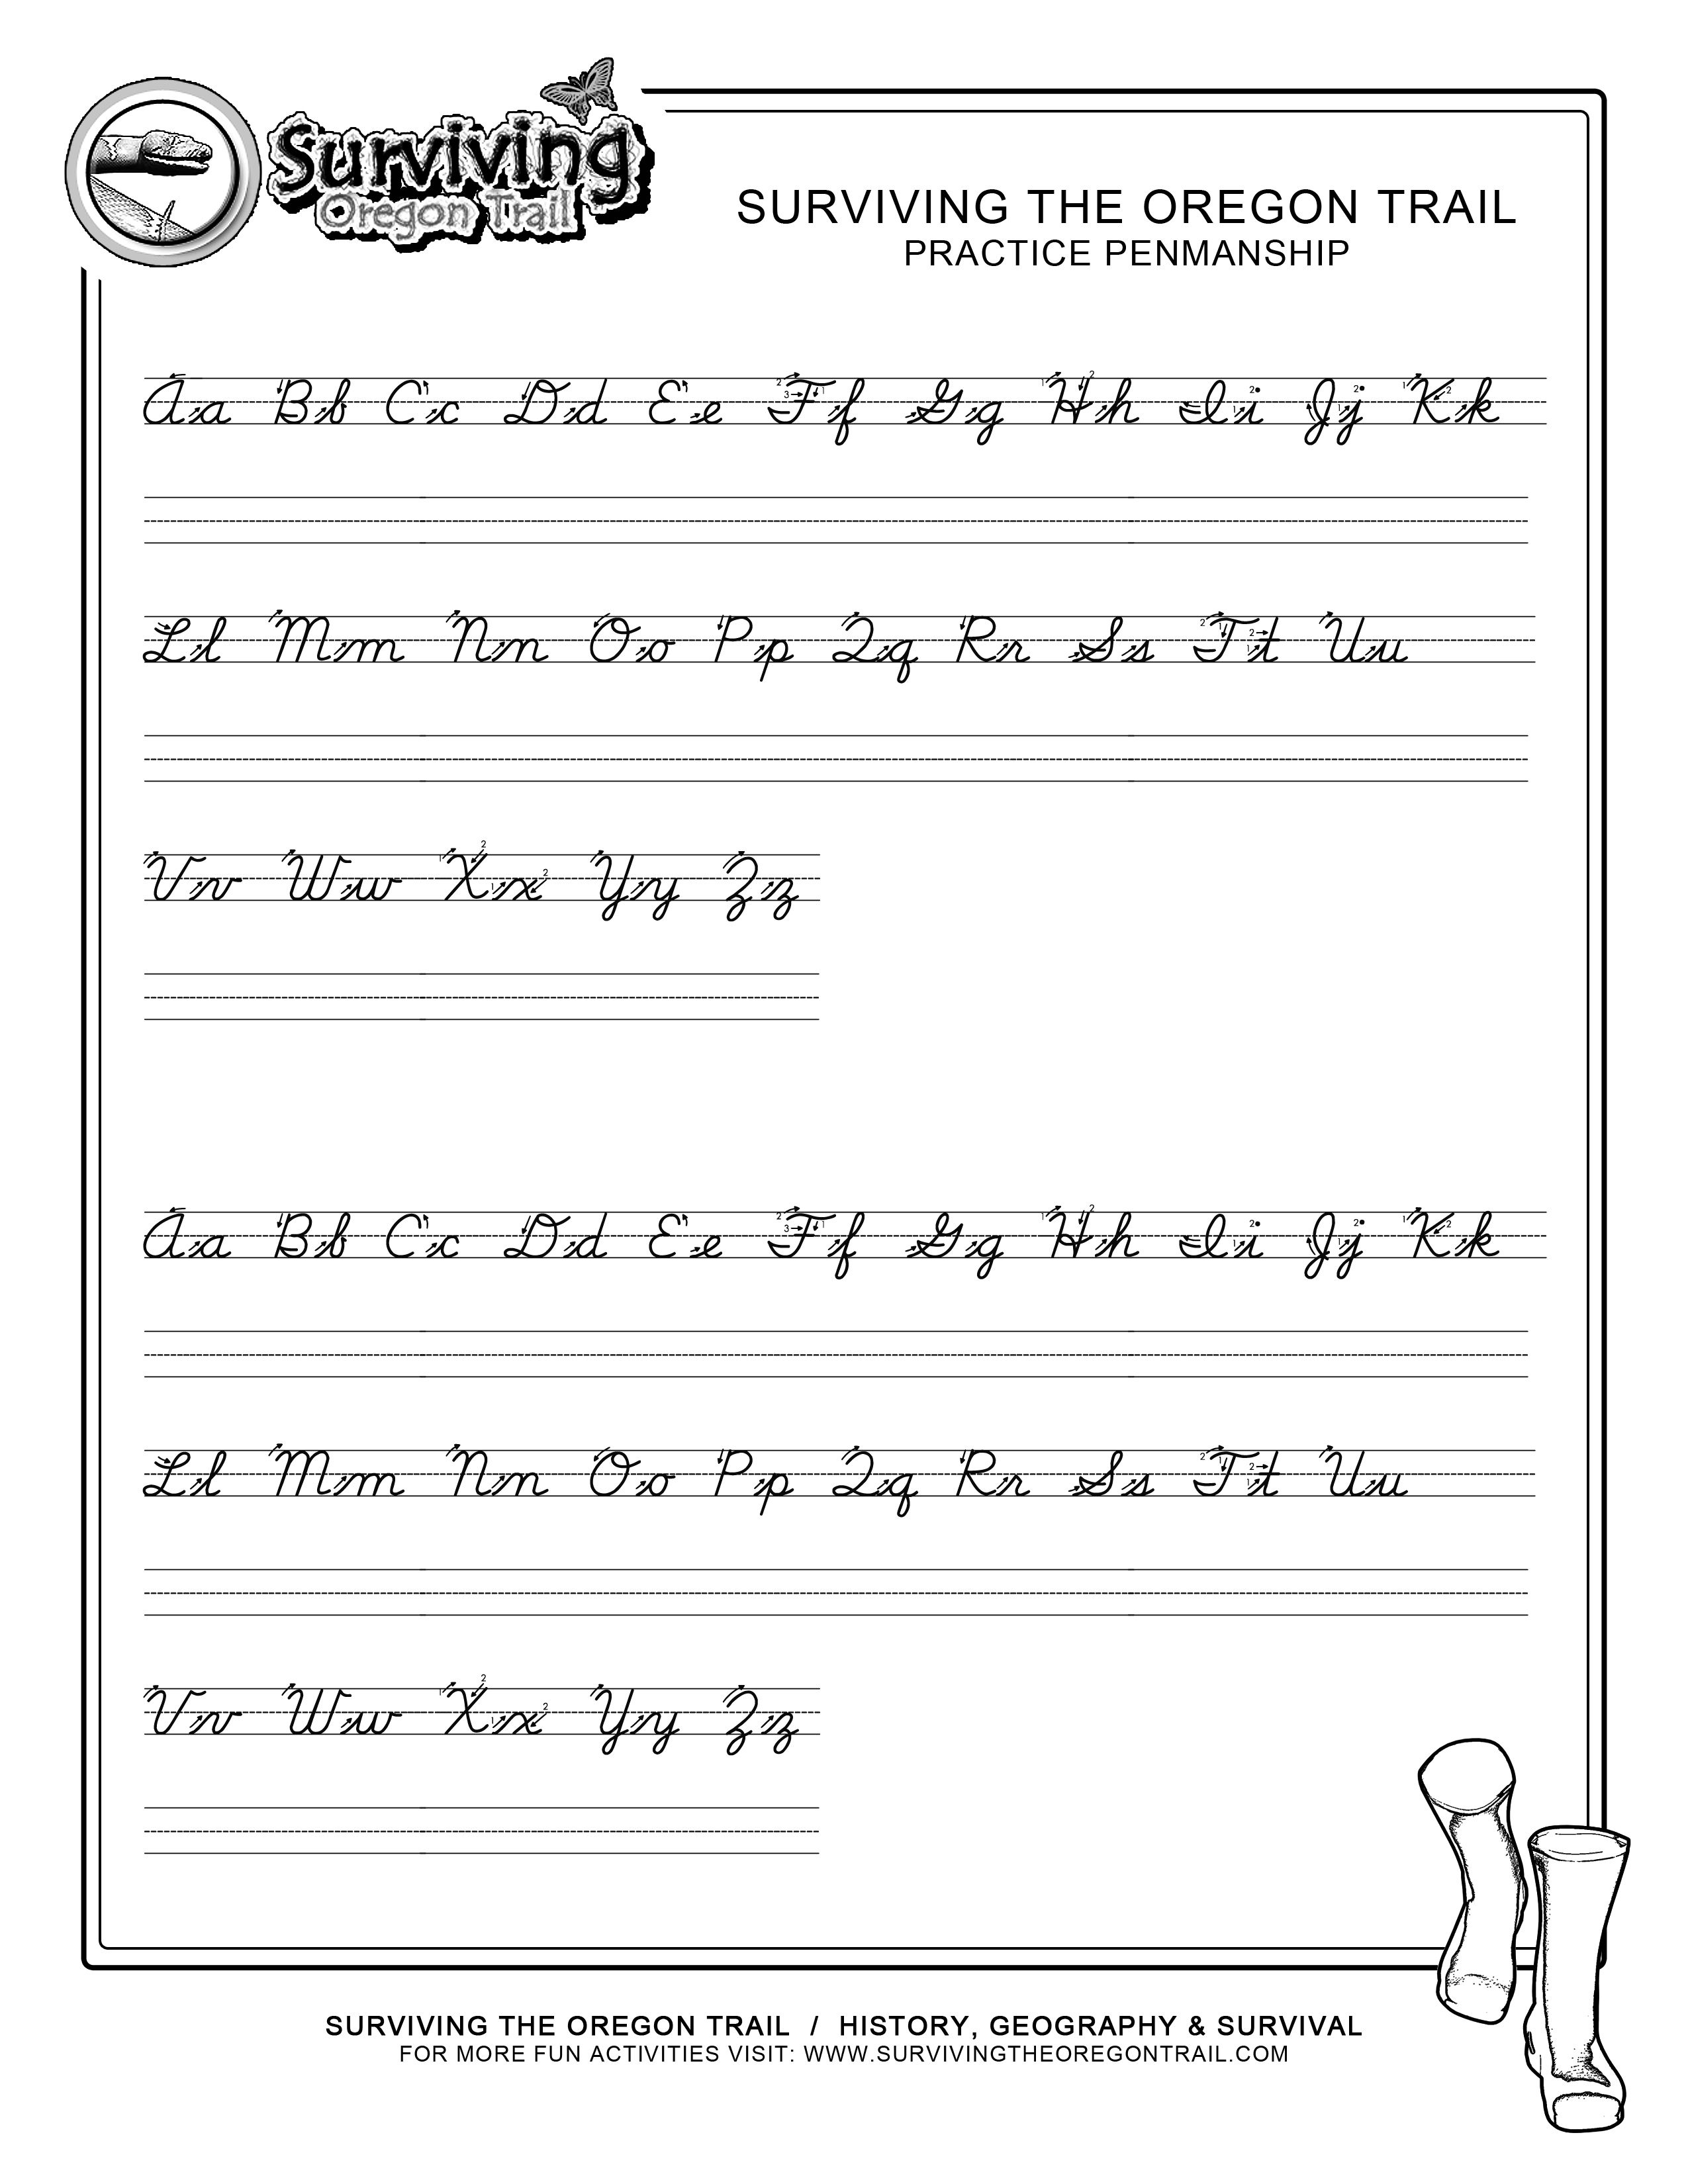 Practice Penmanship – Free Abc's Printable Cursive Writing Worksheet | Printable Cursive Worksheets